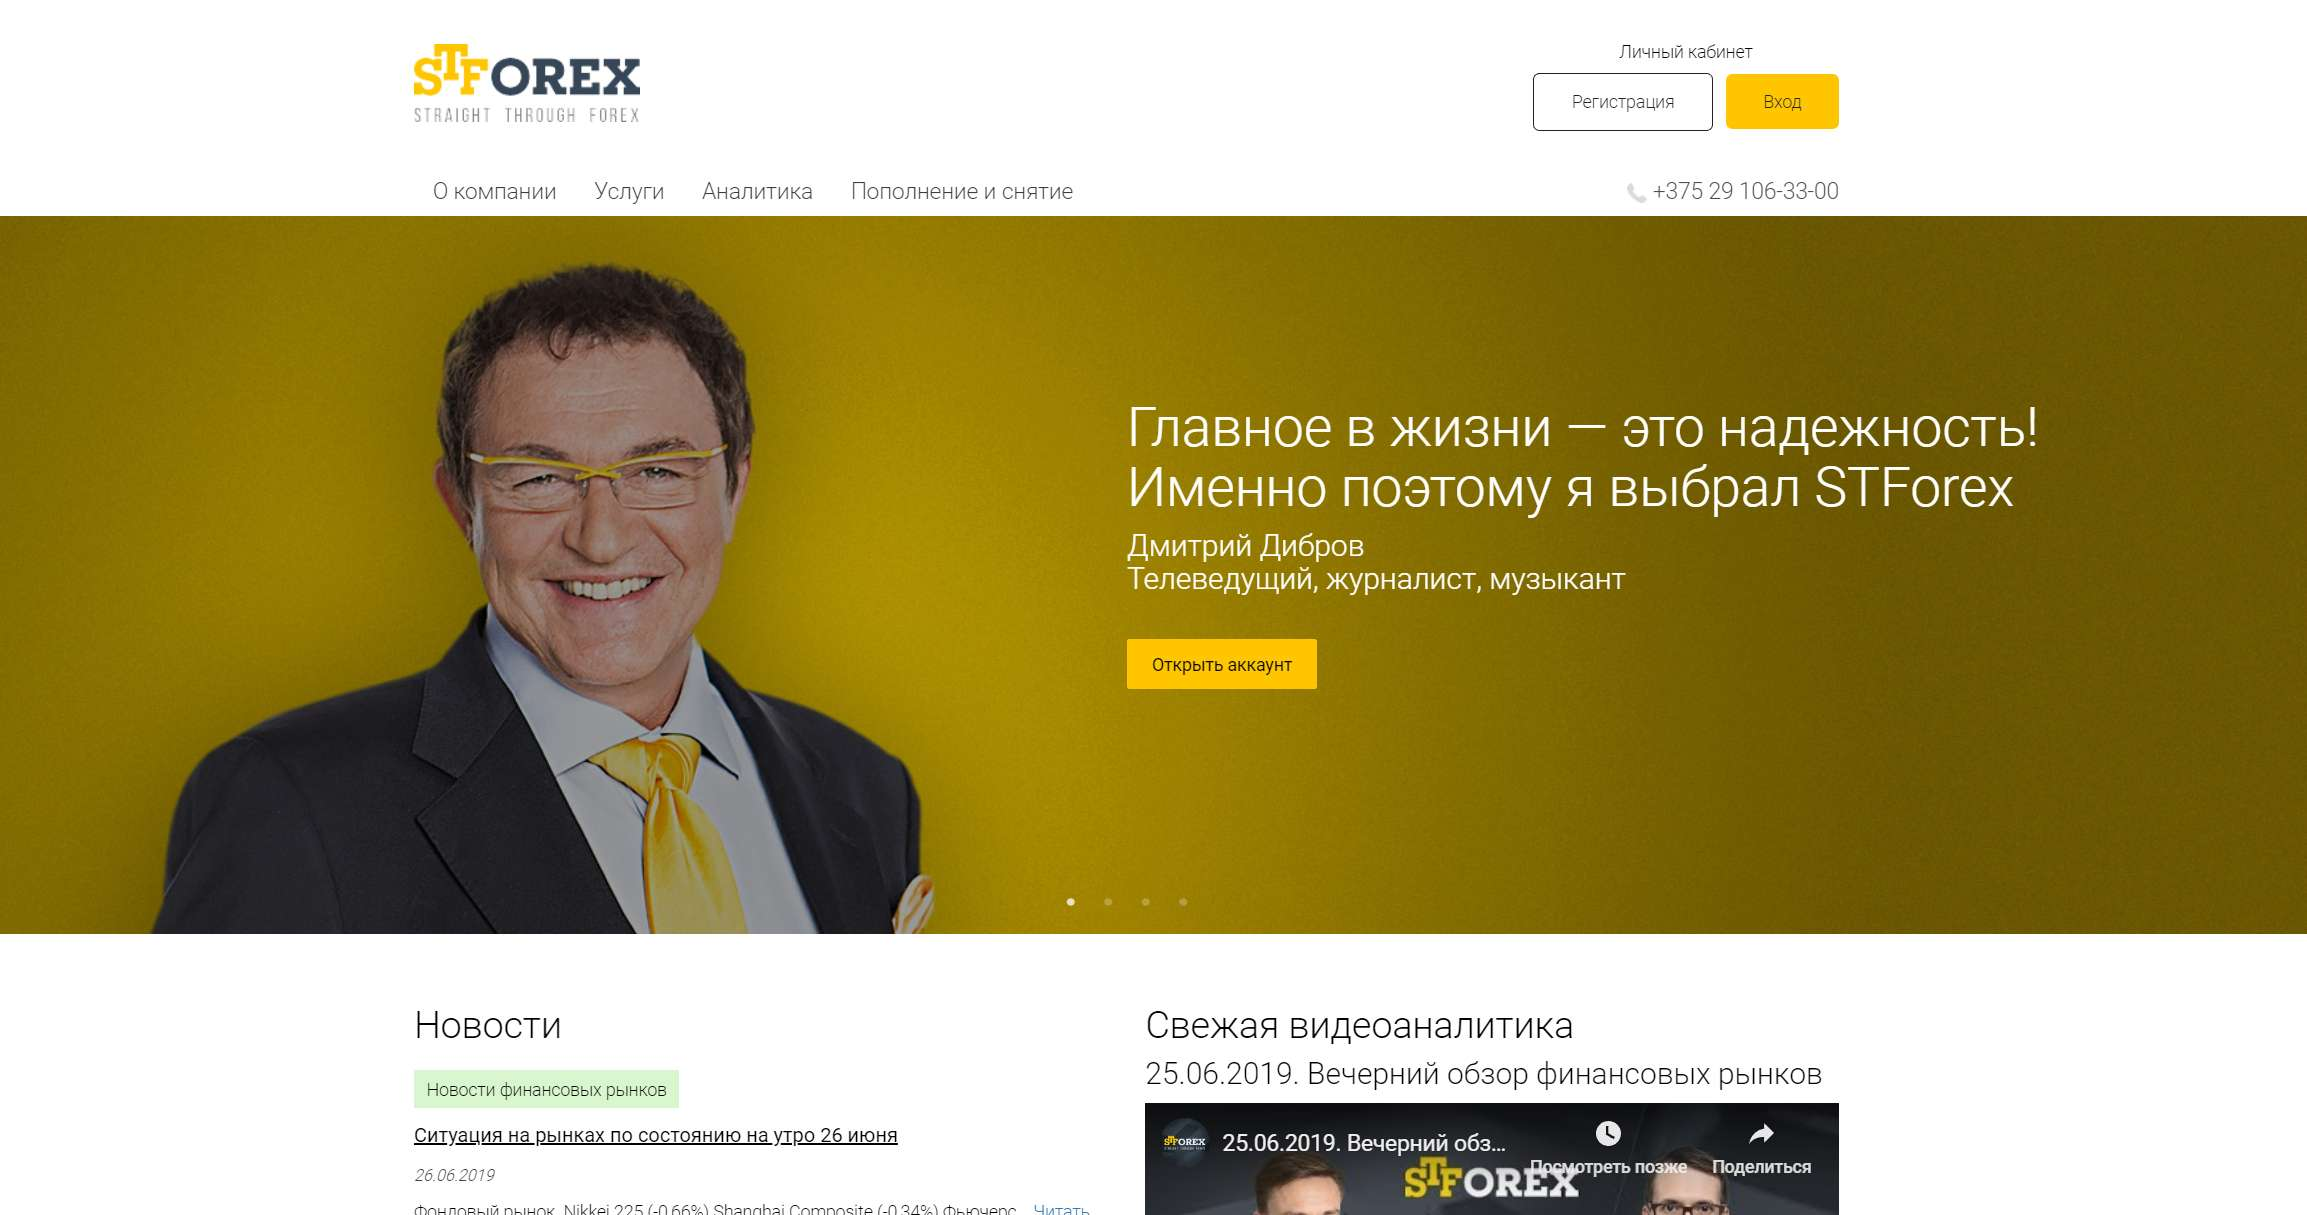 STForex.by – надежный брокер или развод?